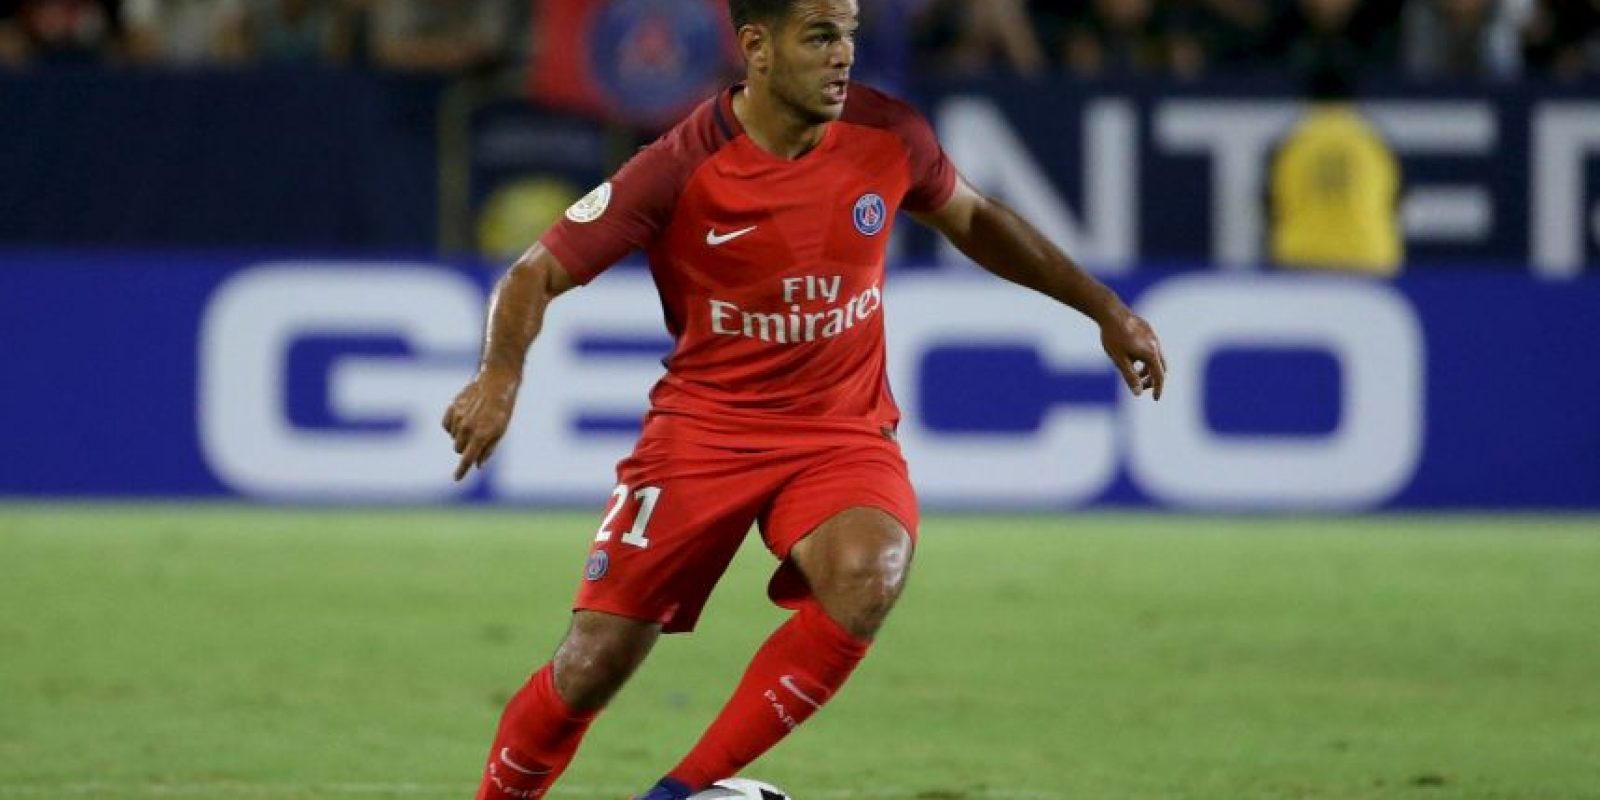 8.PSG-Ligue 1 (526.000 camisetas vendidas – Nike) Foto:Getty Images